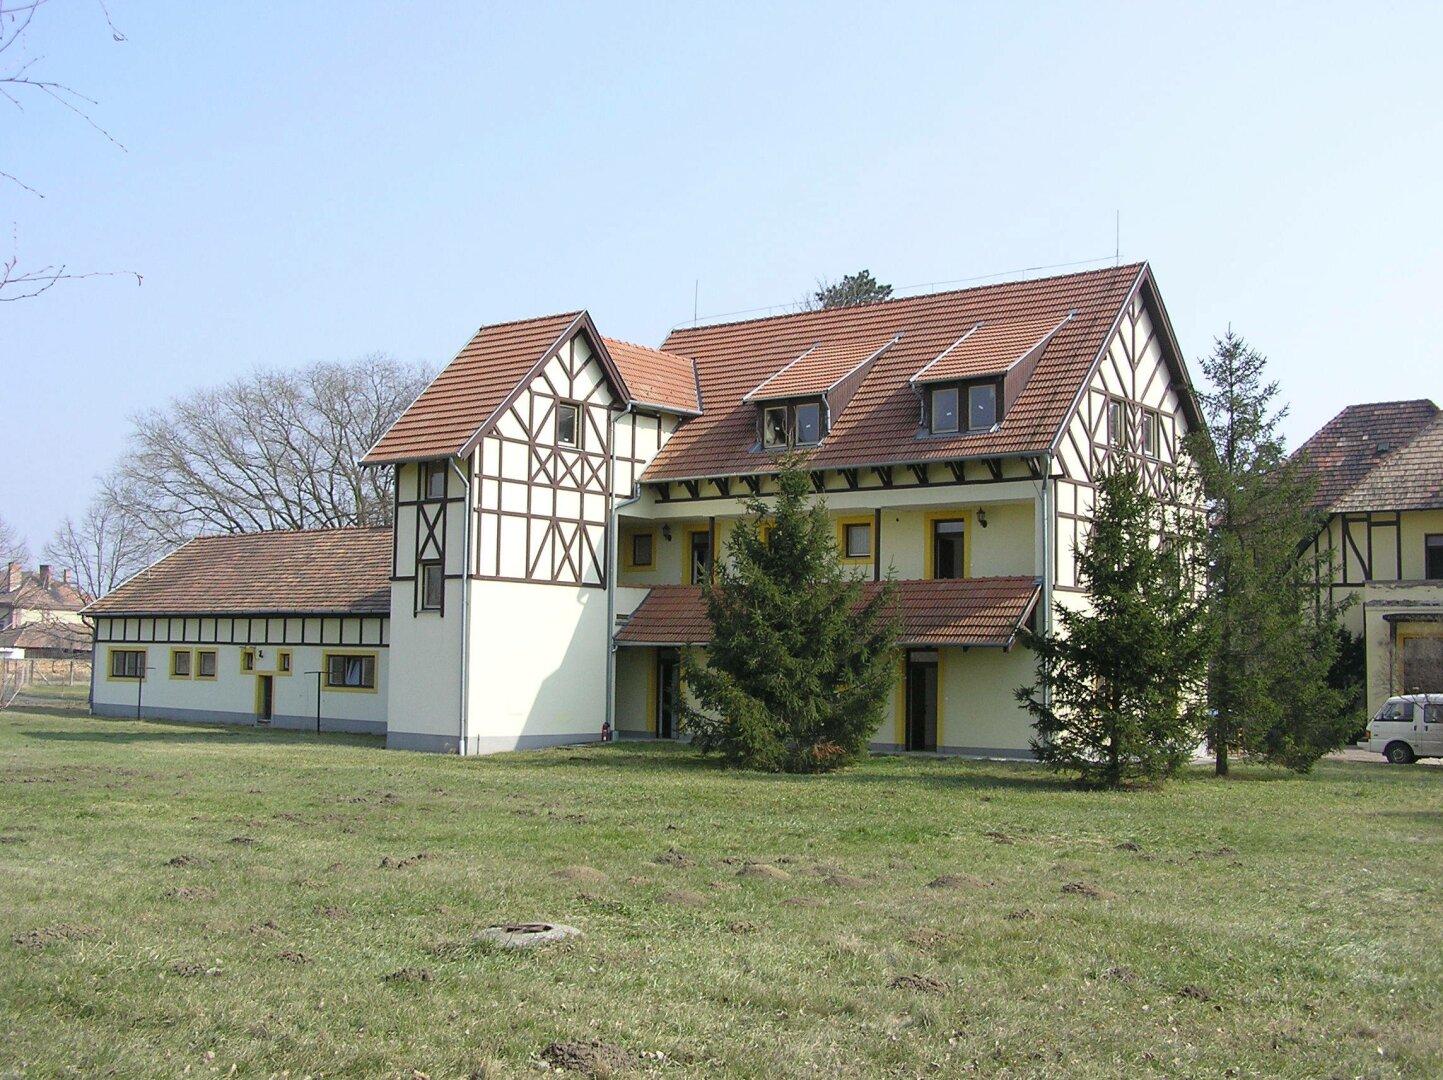 Nebengebäude mit 9 Appartments Sauna Wellness